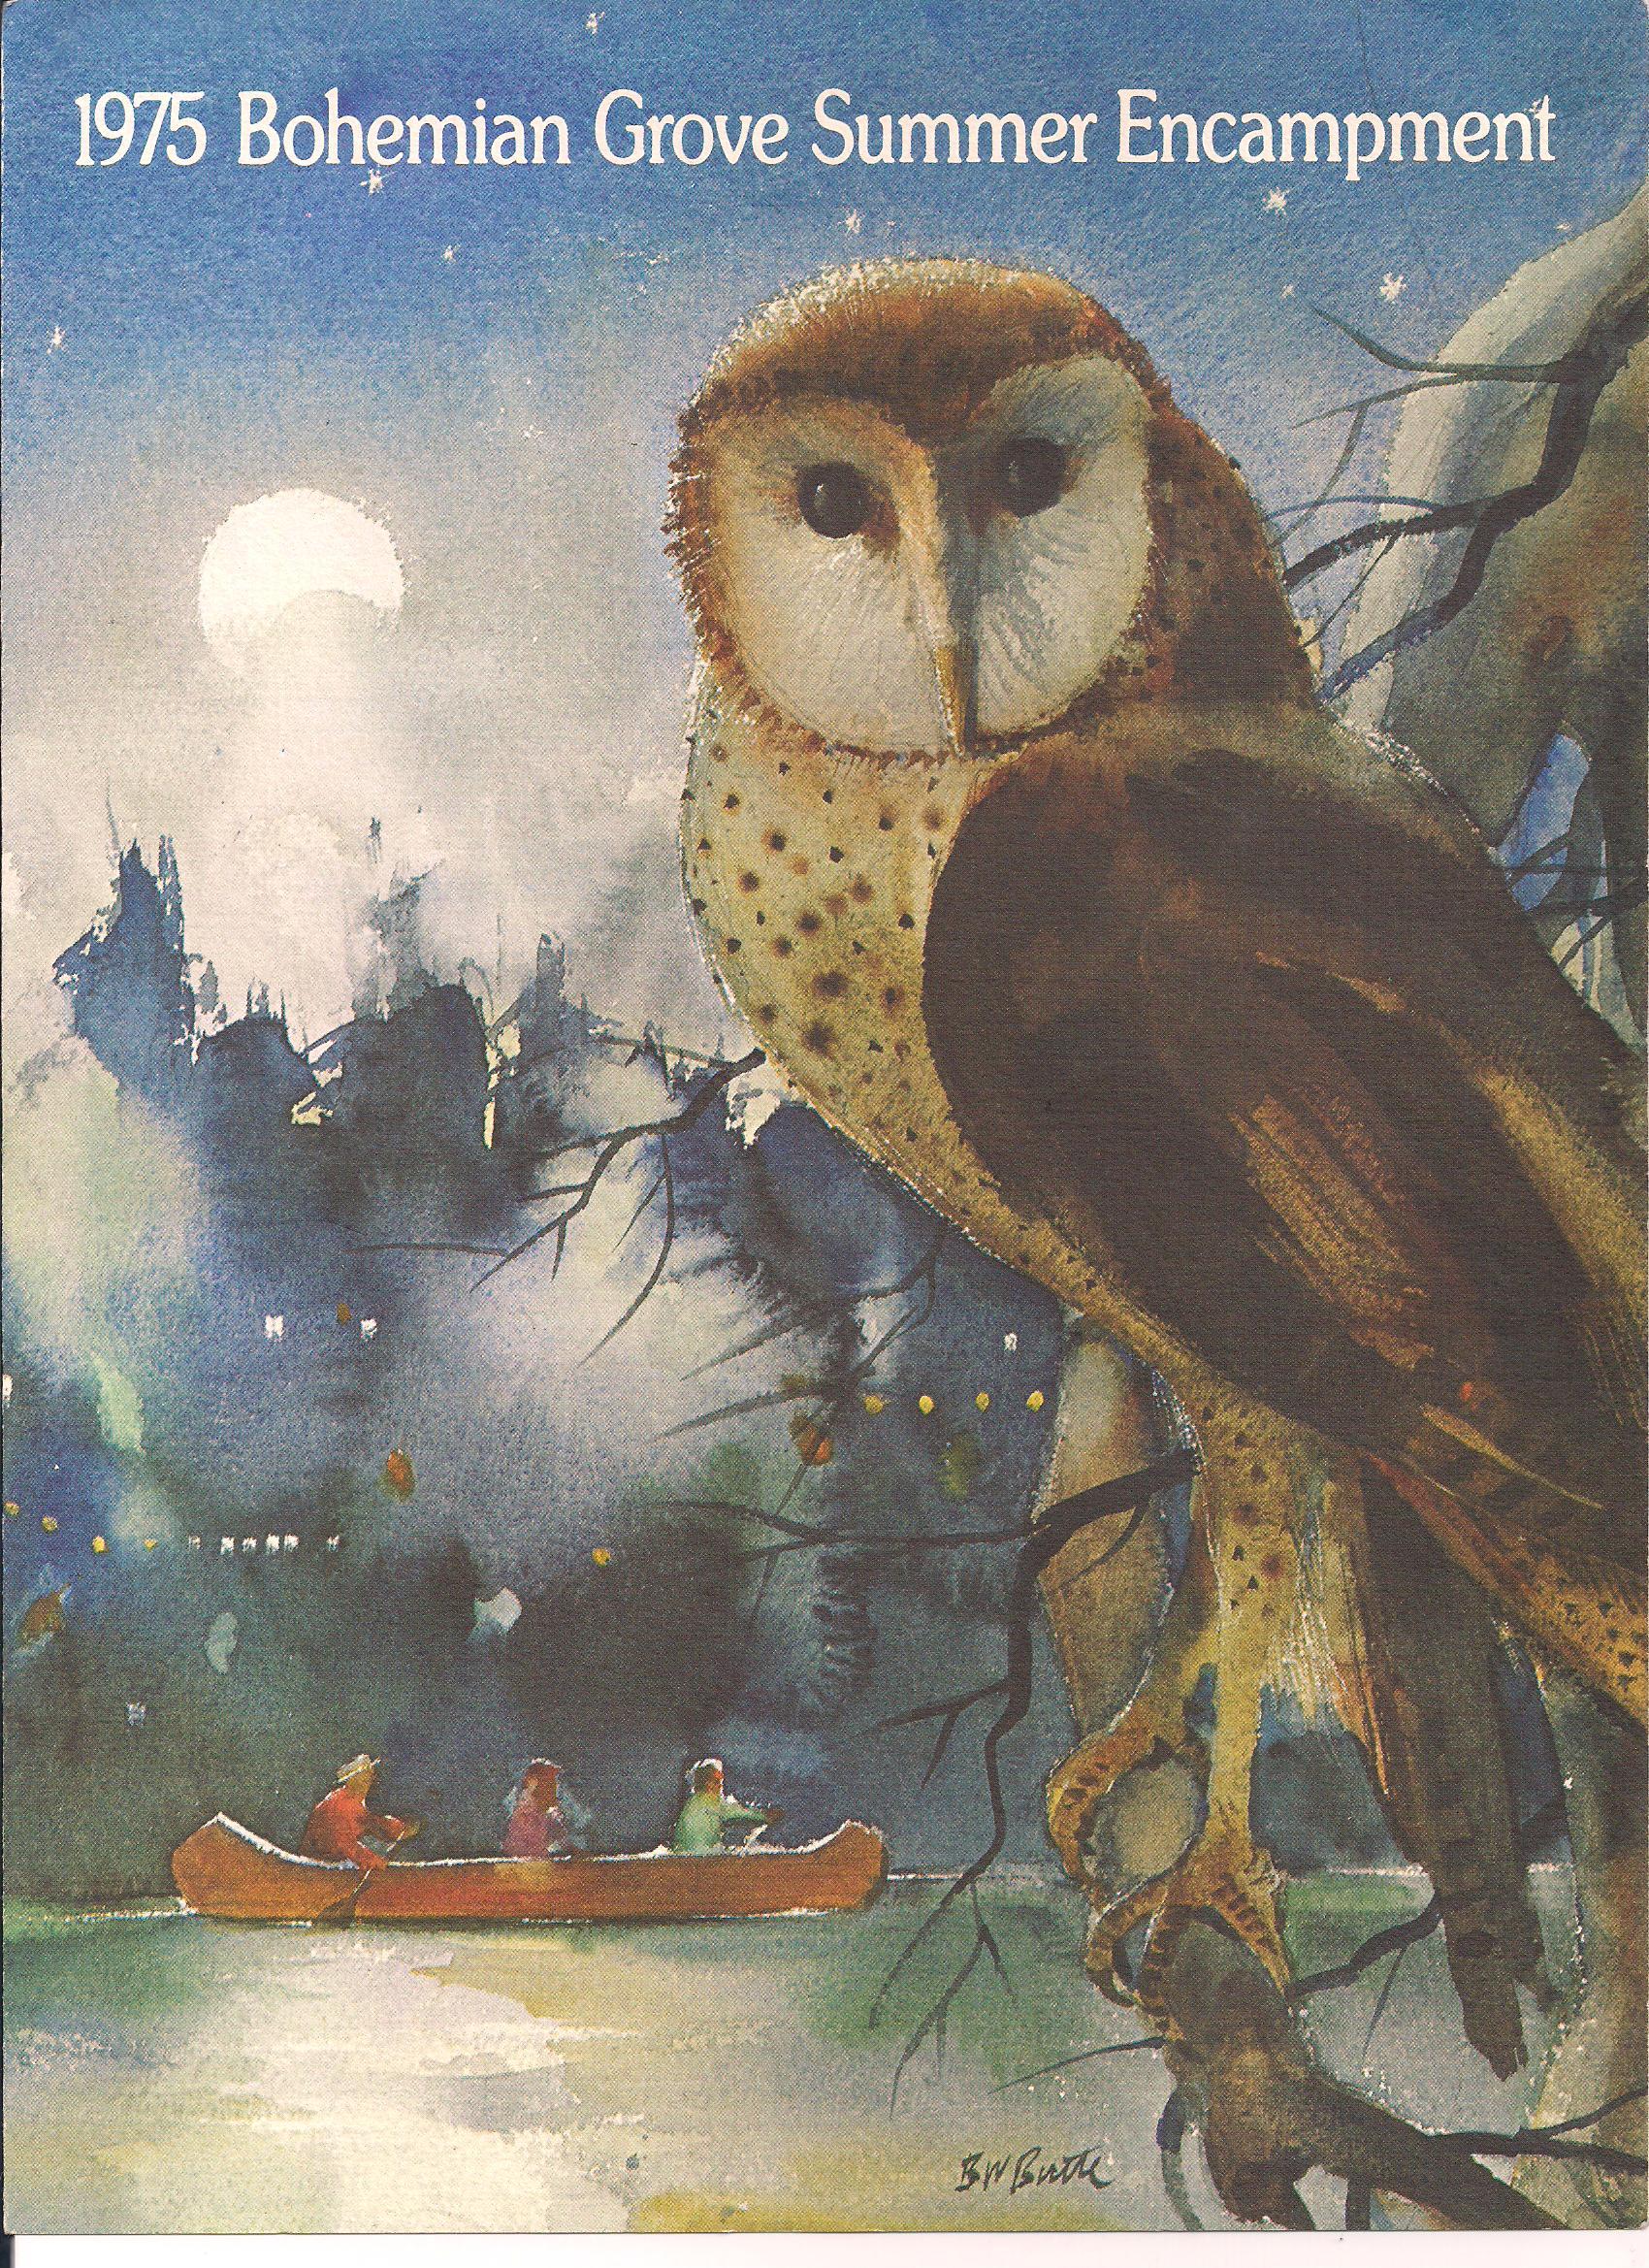 bohemian grove program cover.jpg